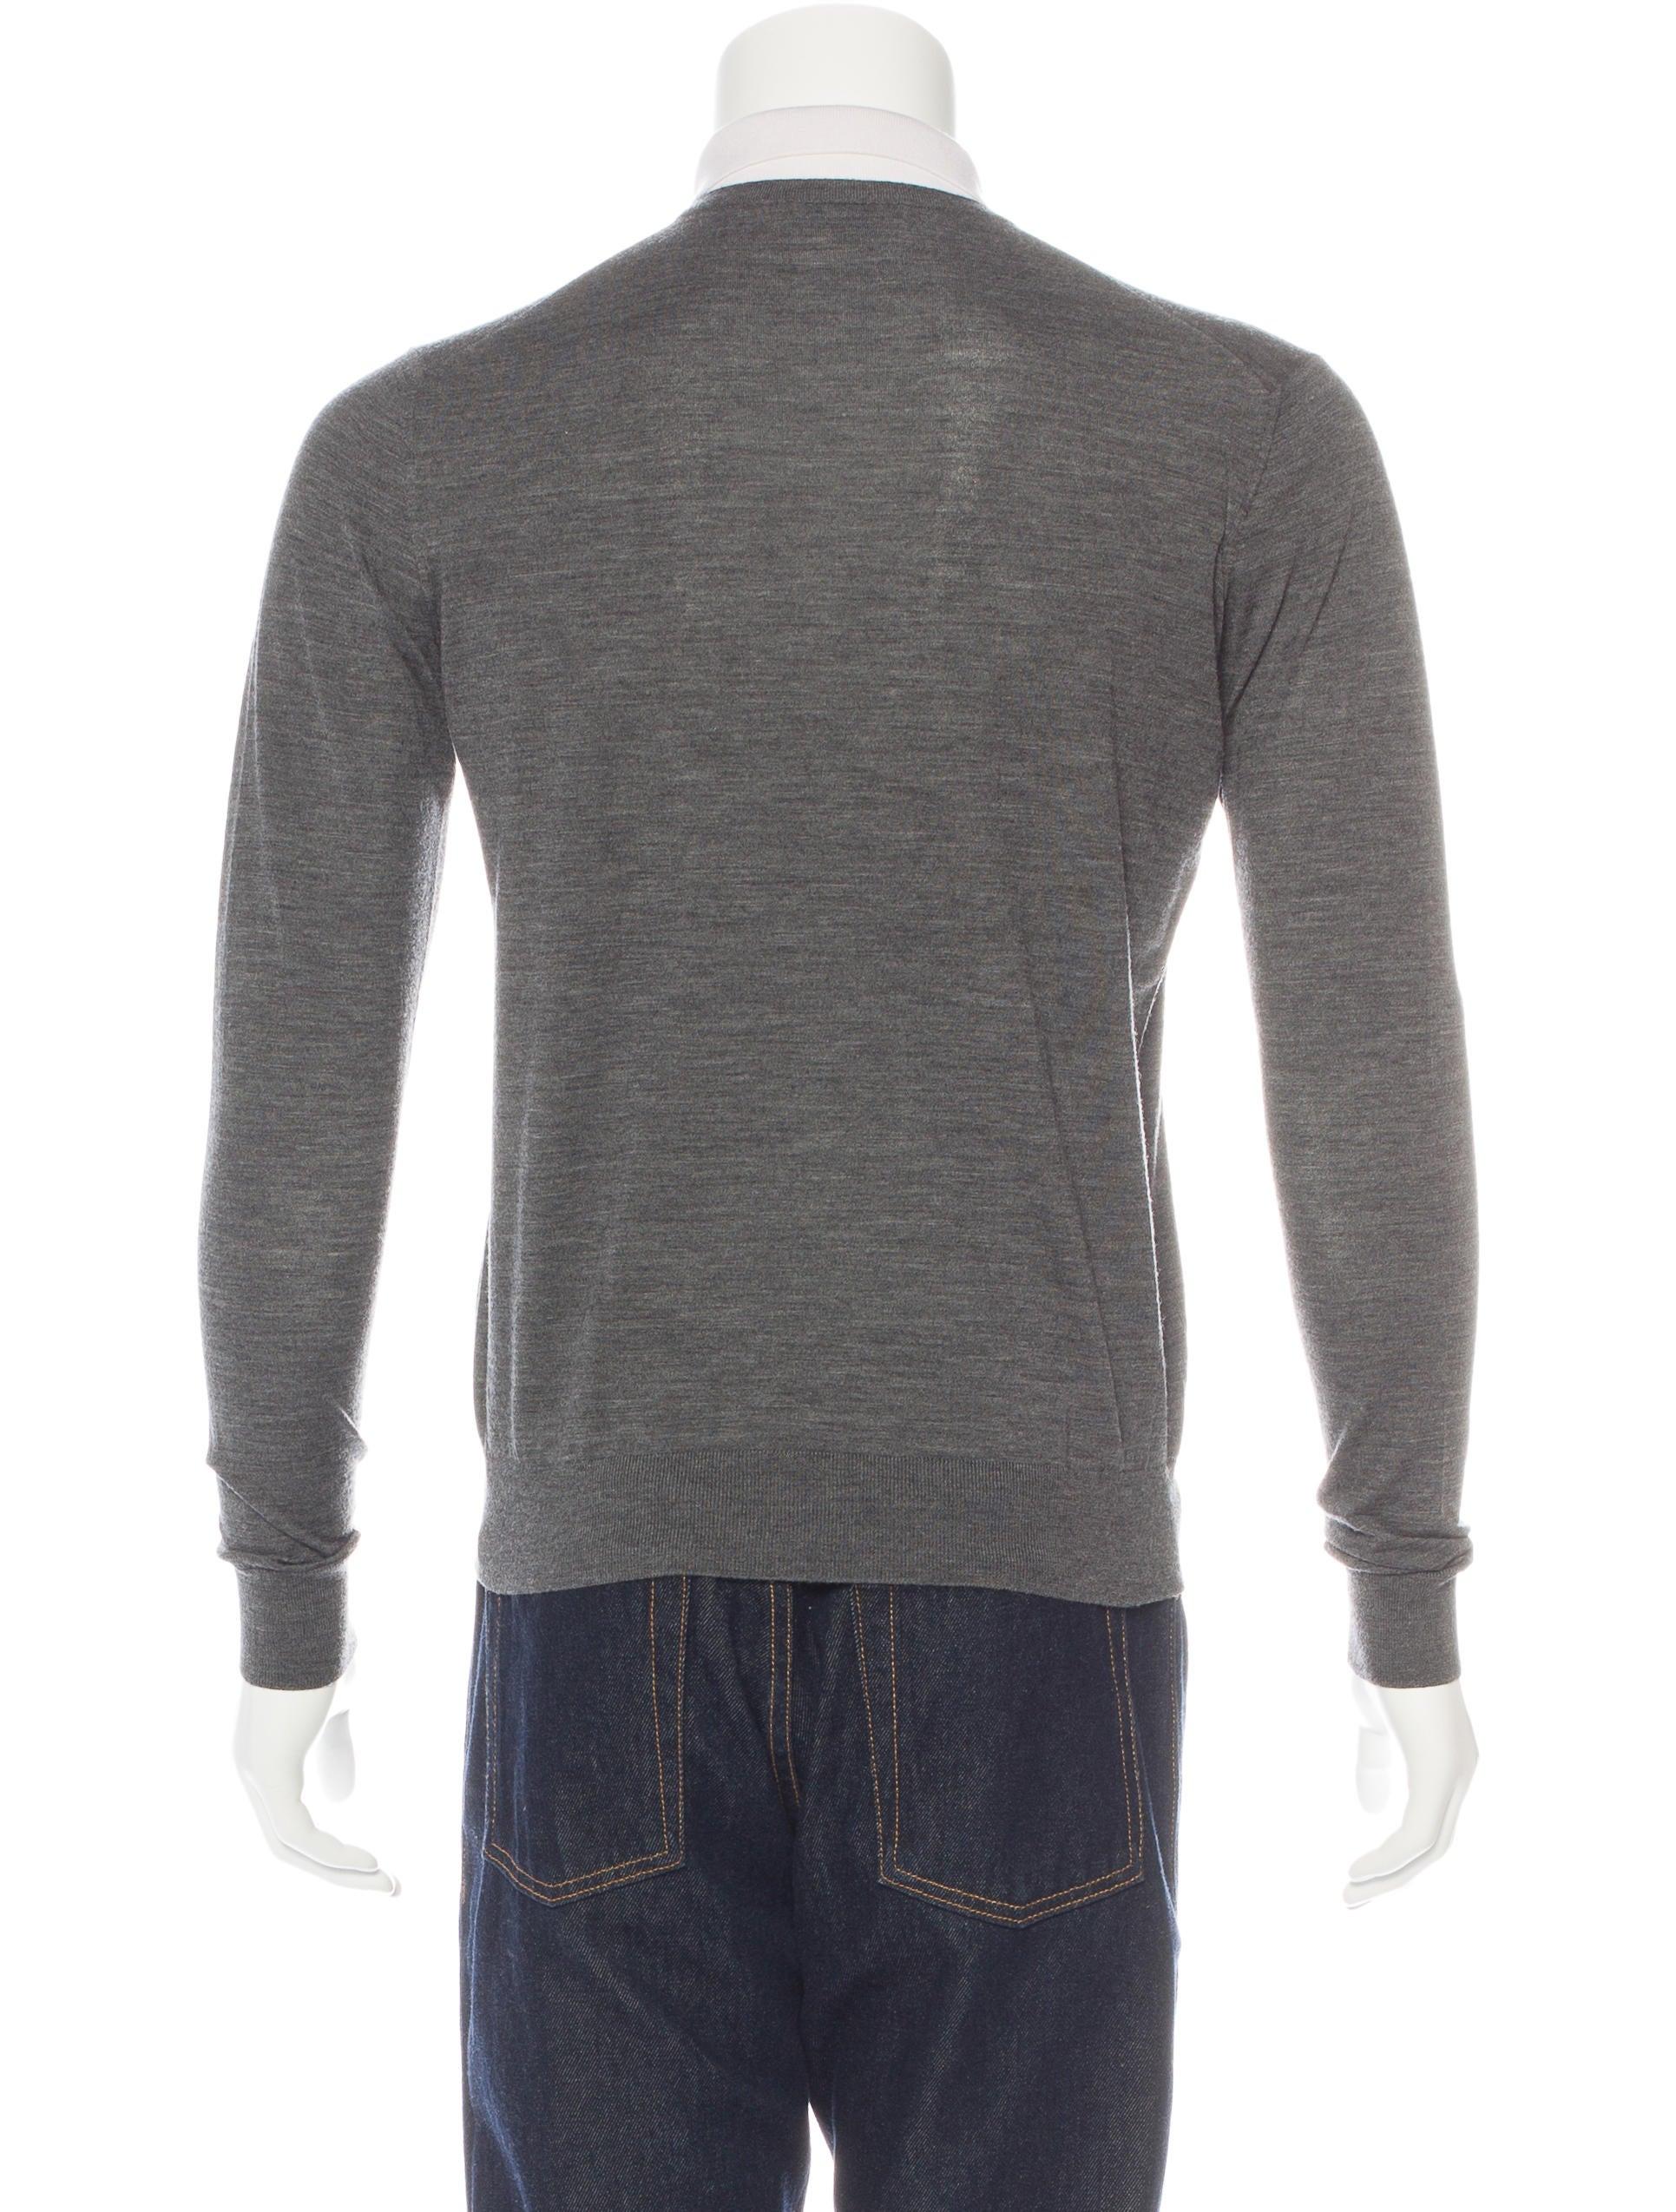 prada v neck polo sweater clothing pra140036 the realreal. Black Bedroom Furniture Sets. Home Design Ideas